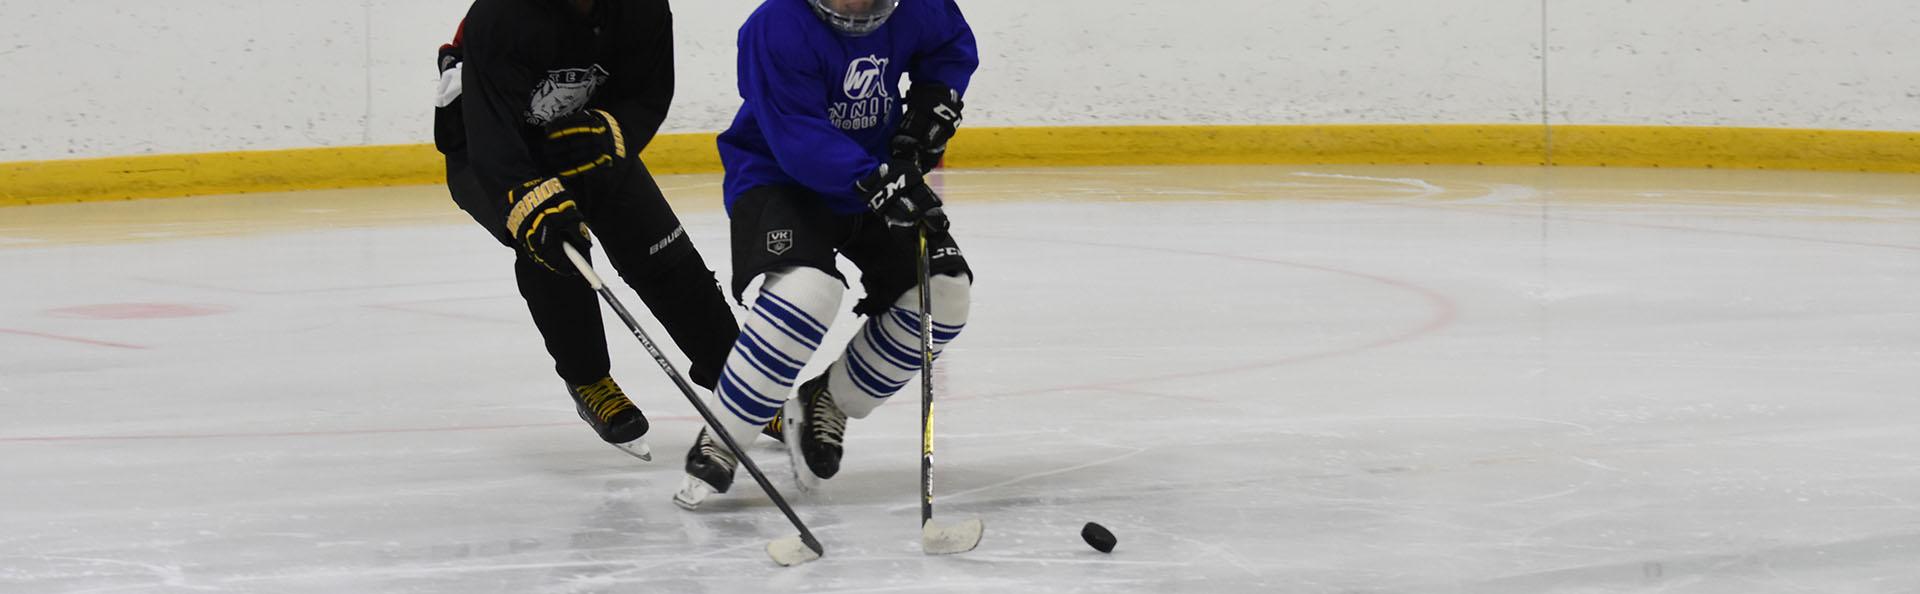 Summer Hockey Camp Ontario, Canada | Overnight & Day Camp